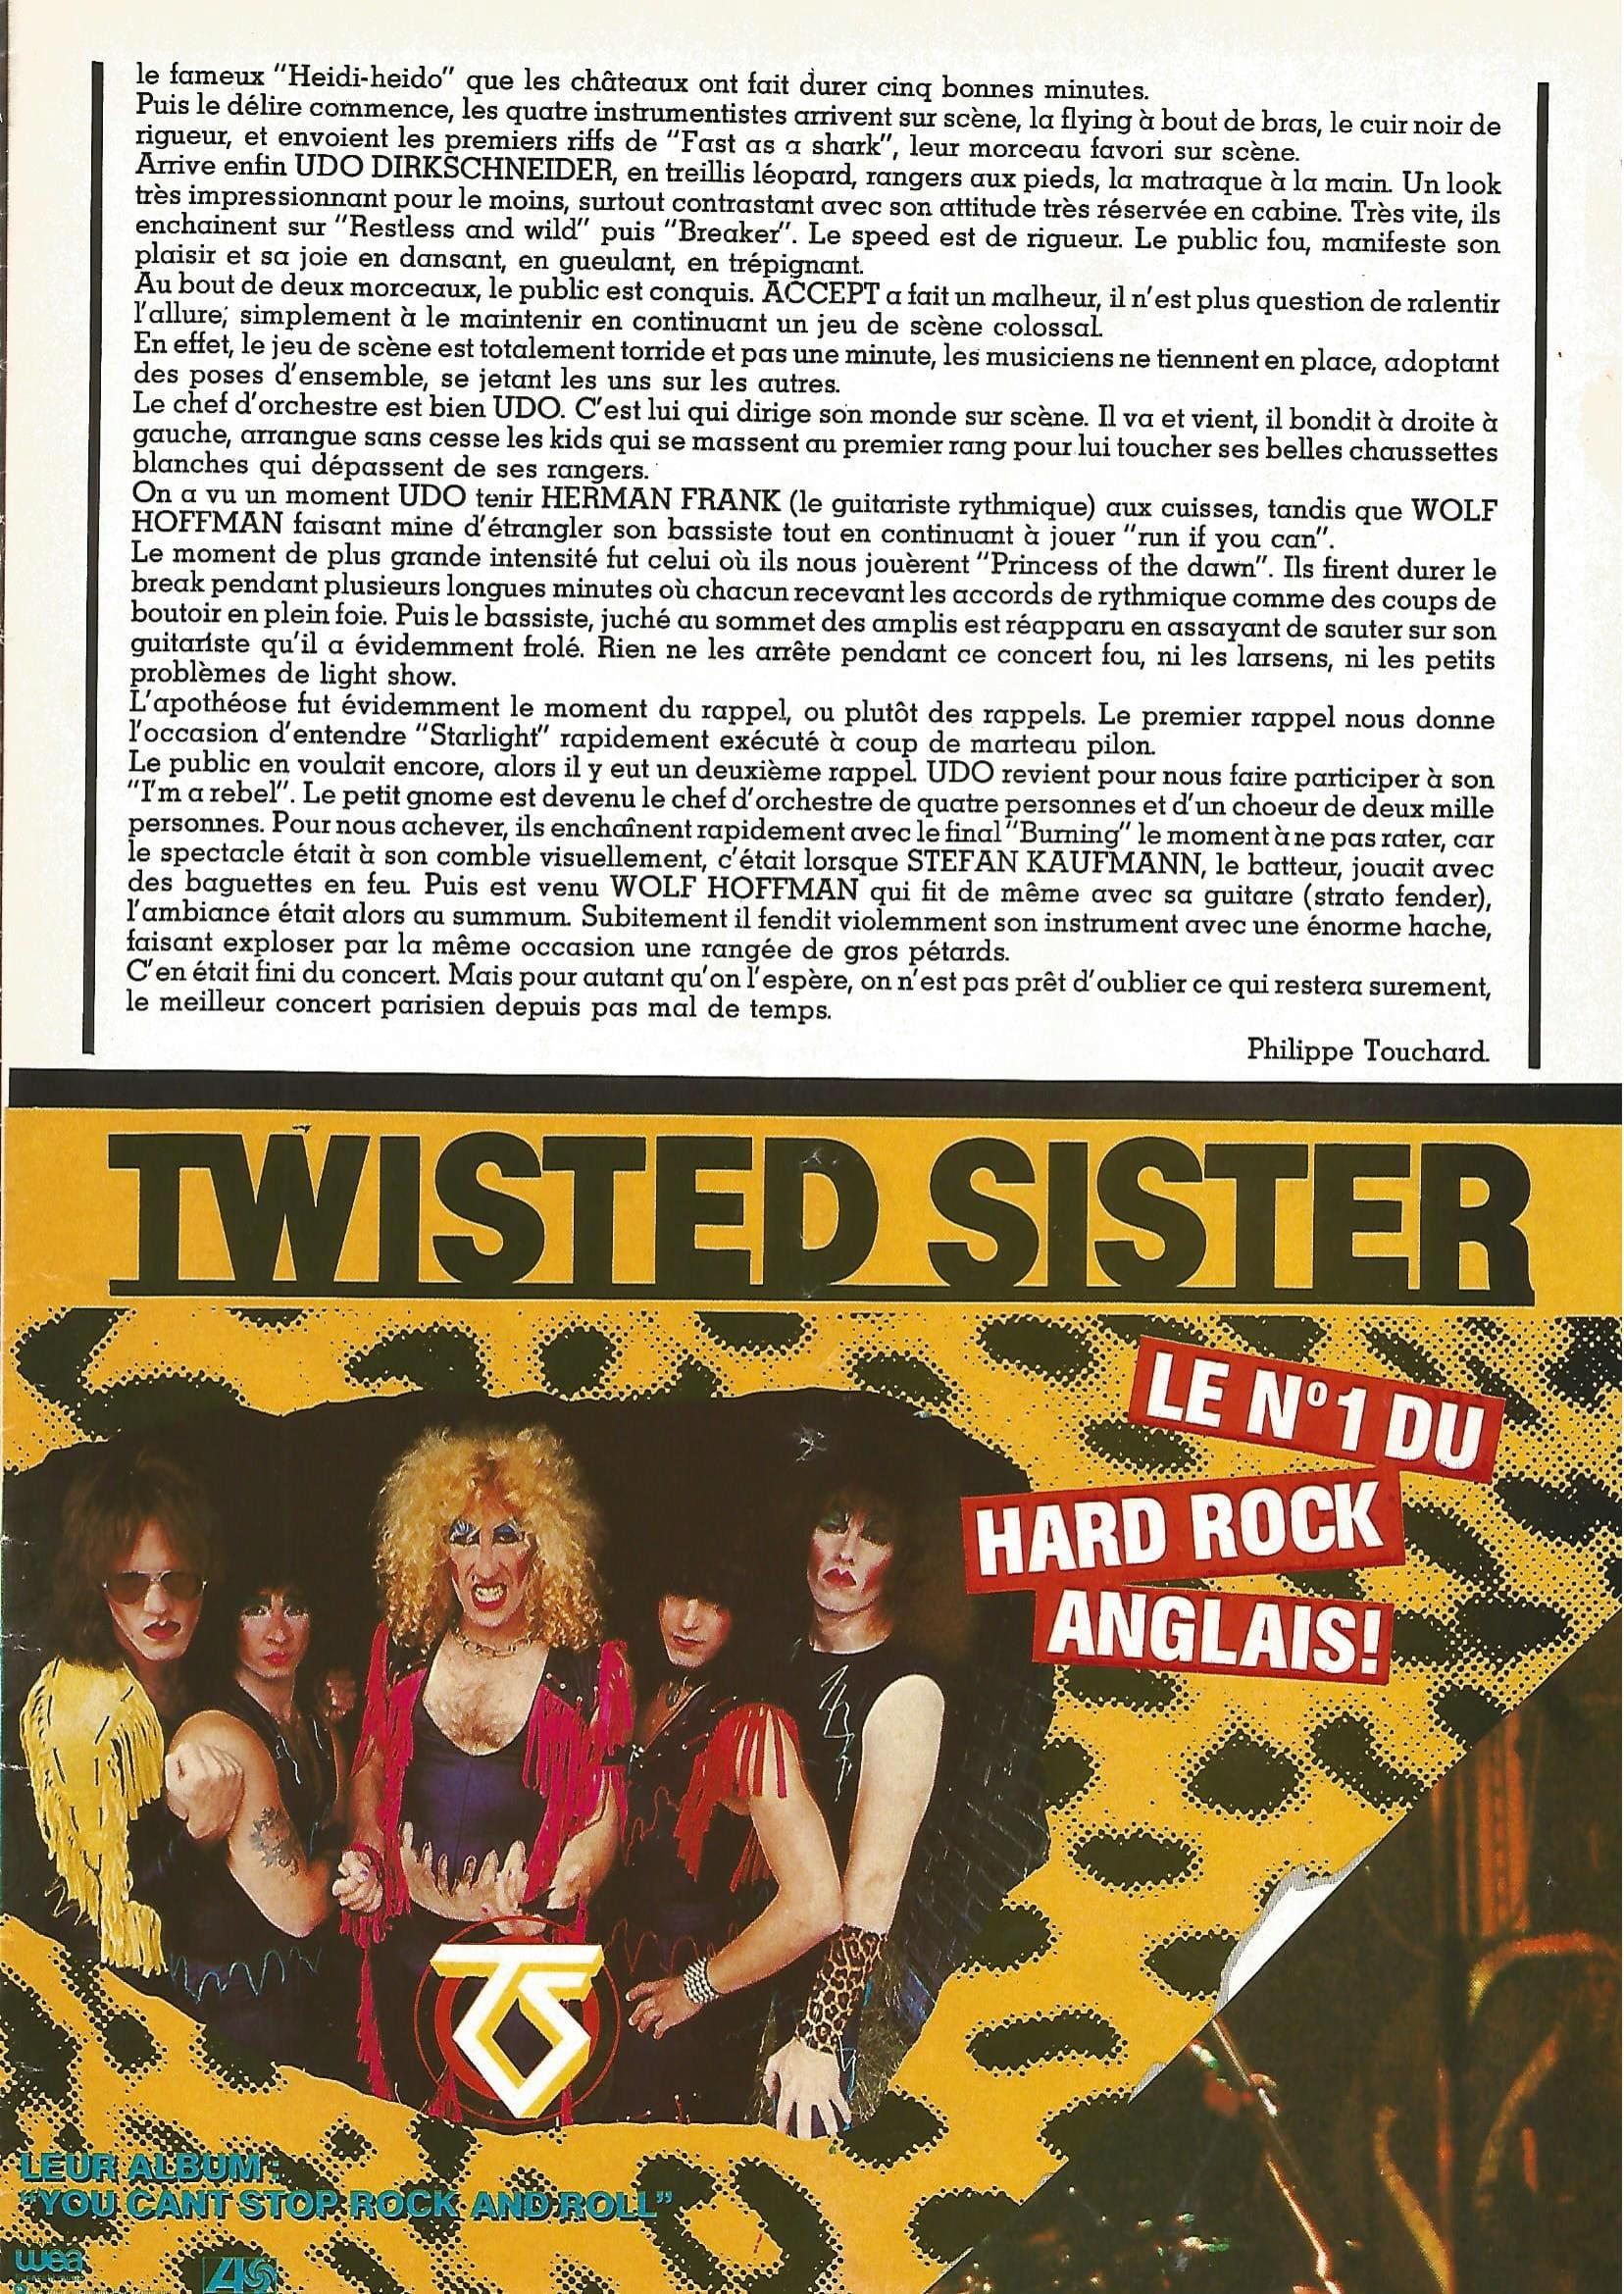 Interview ACCEPT dans ENFER MAG n°2 MAI 1983 (archive) Enfer_31